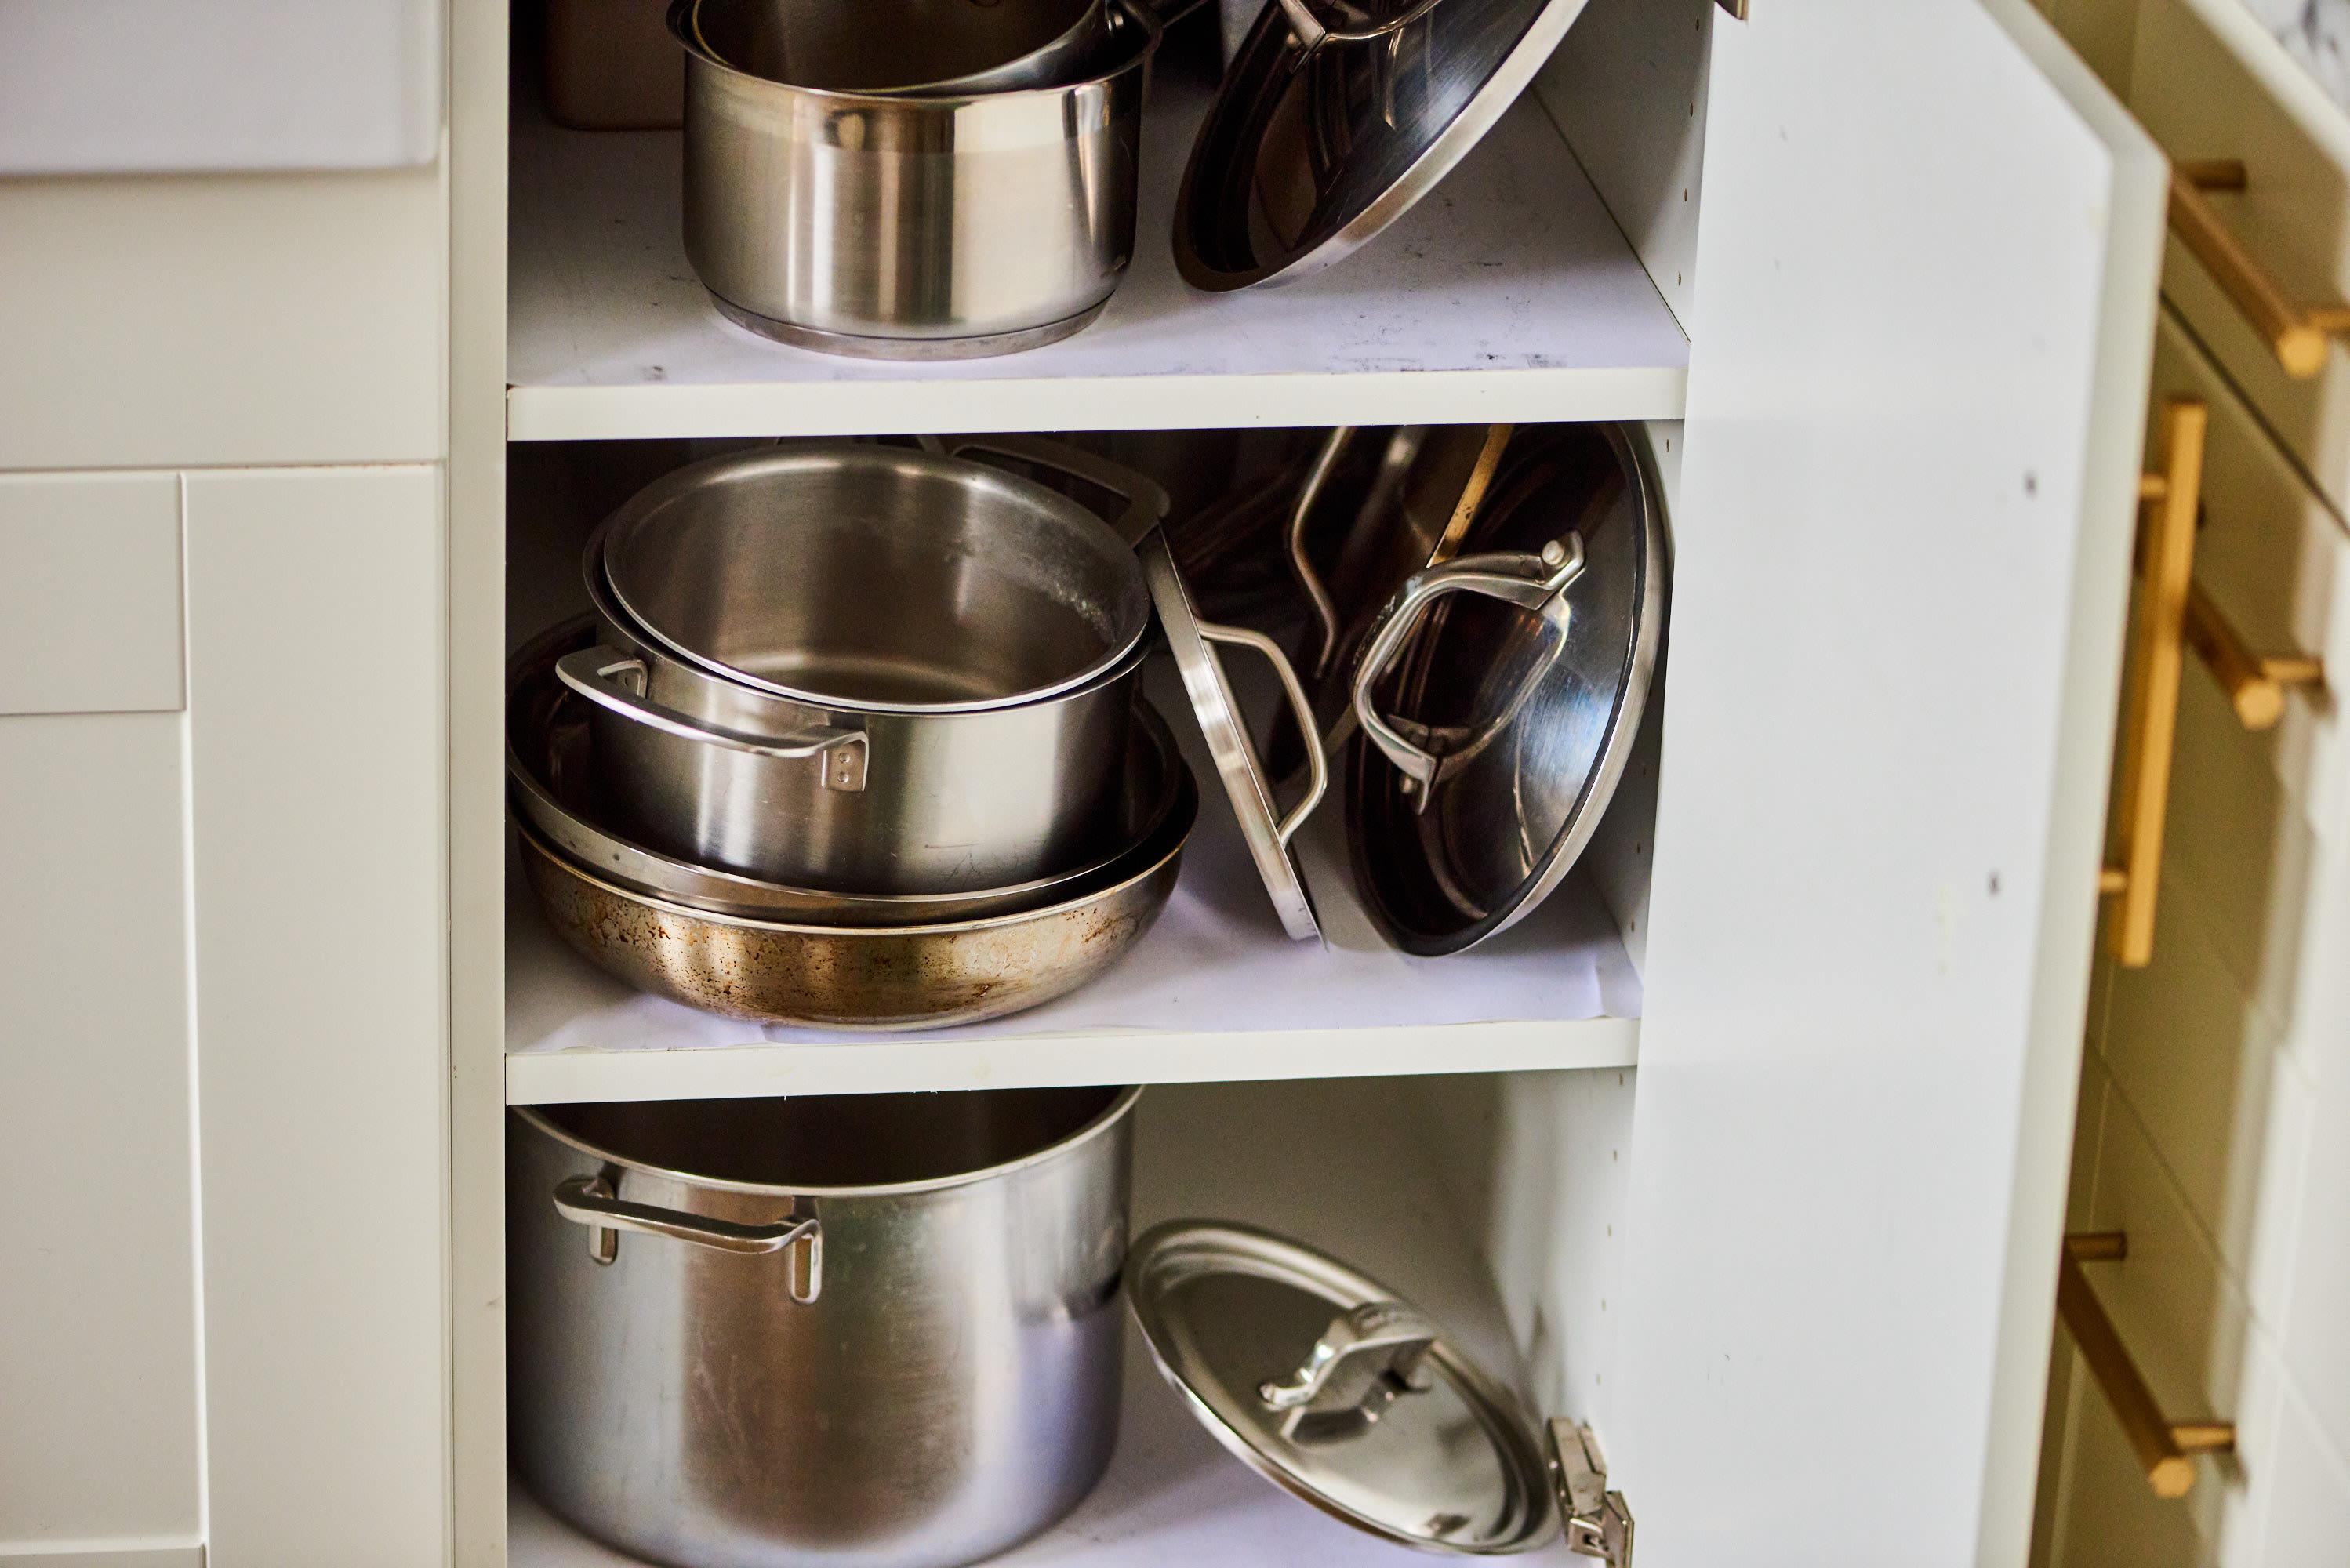 10 Clever Pot Lid Organizer Ideas How To Store Pot Lids Kitchn